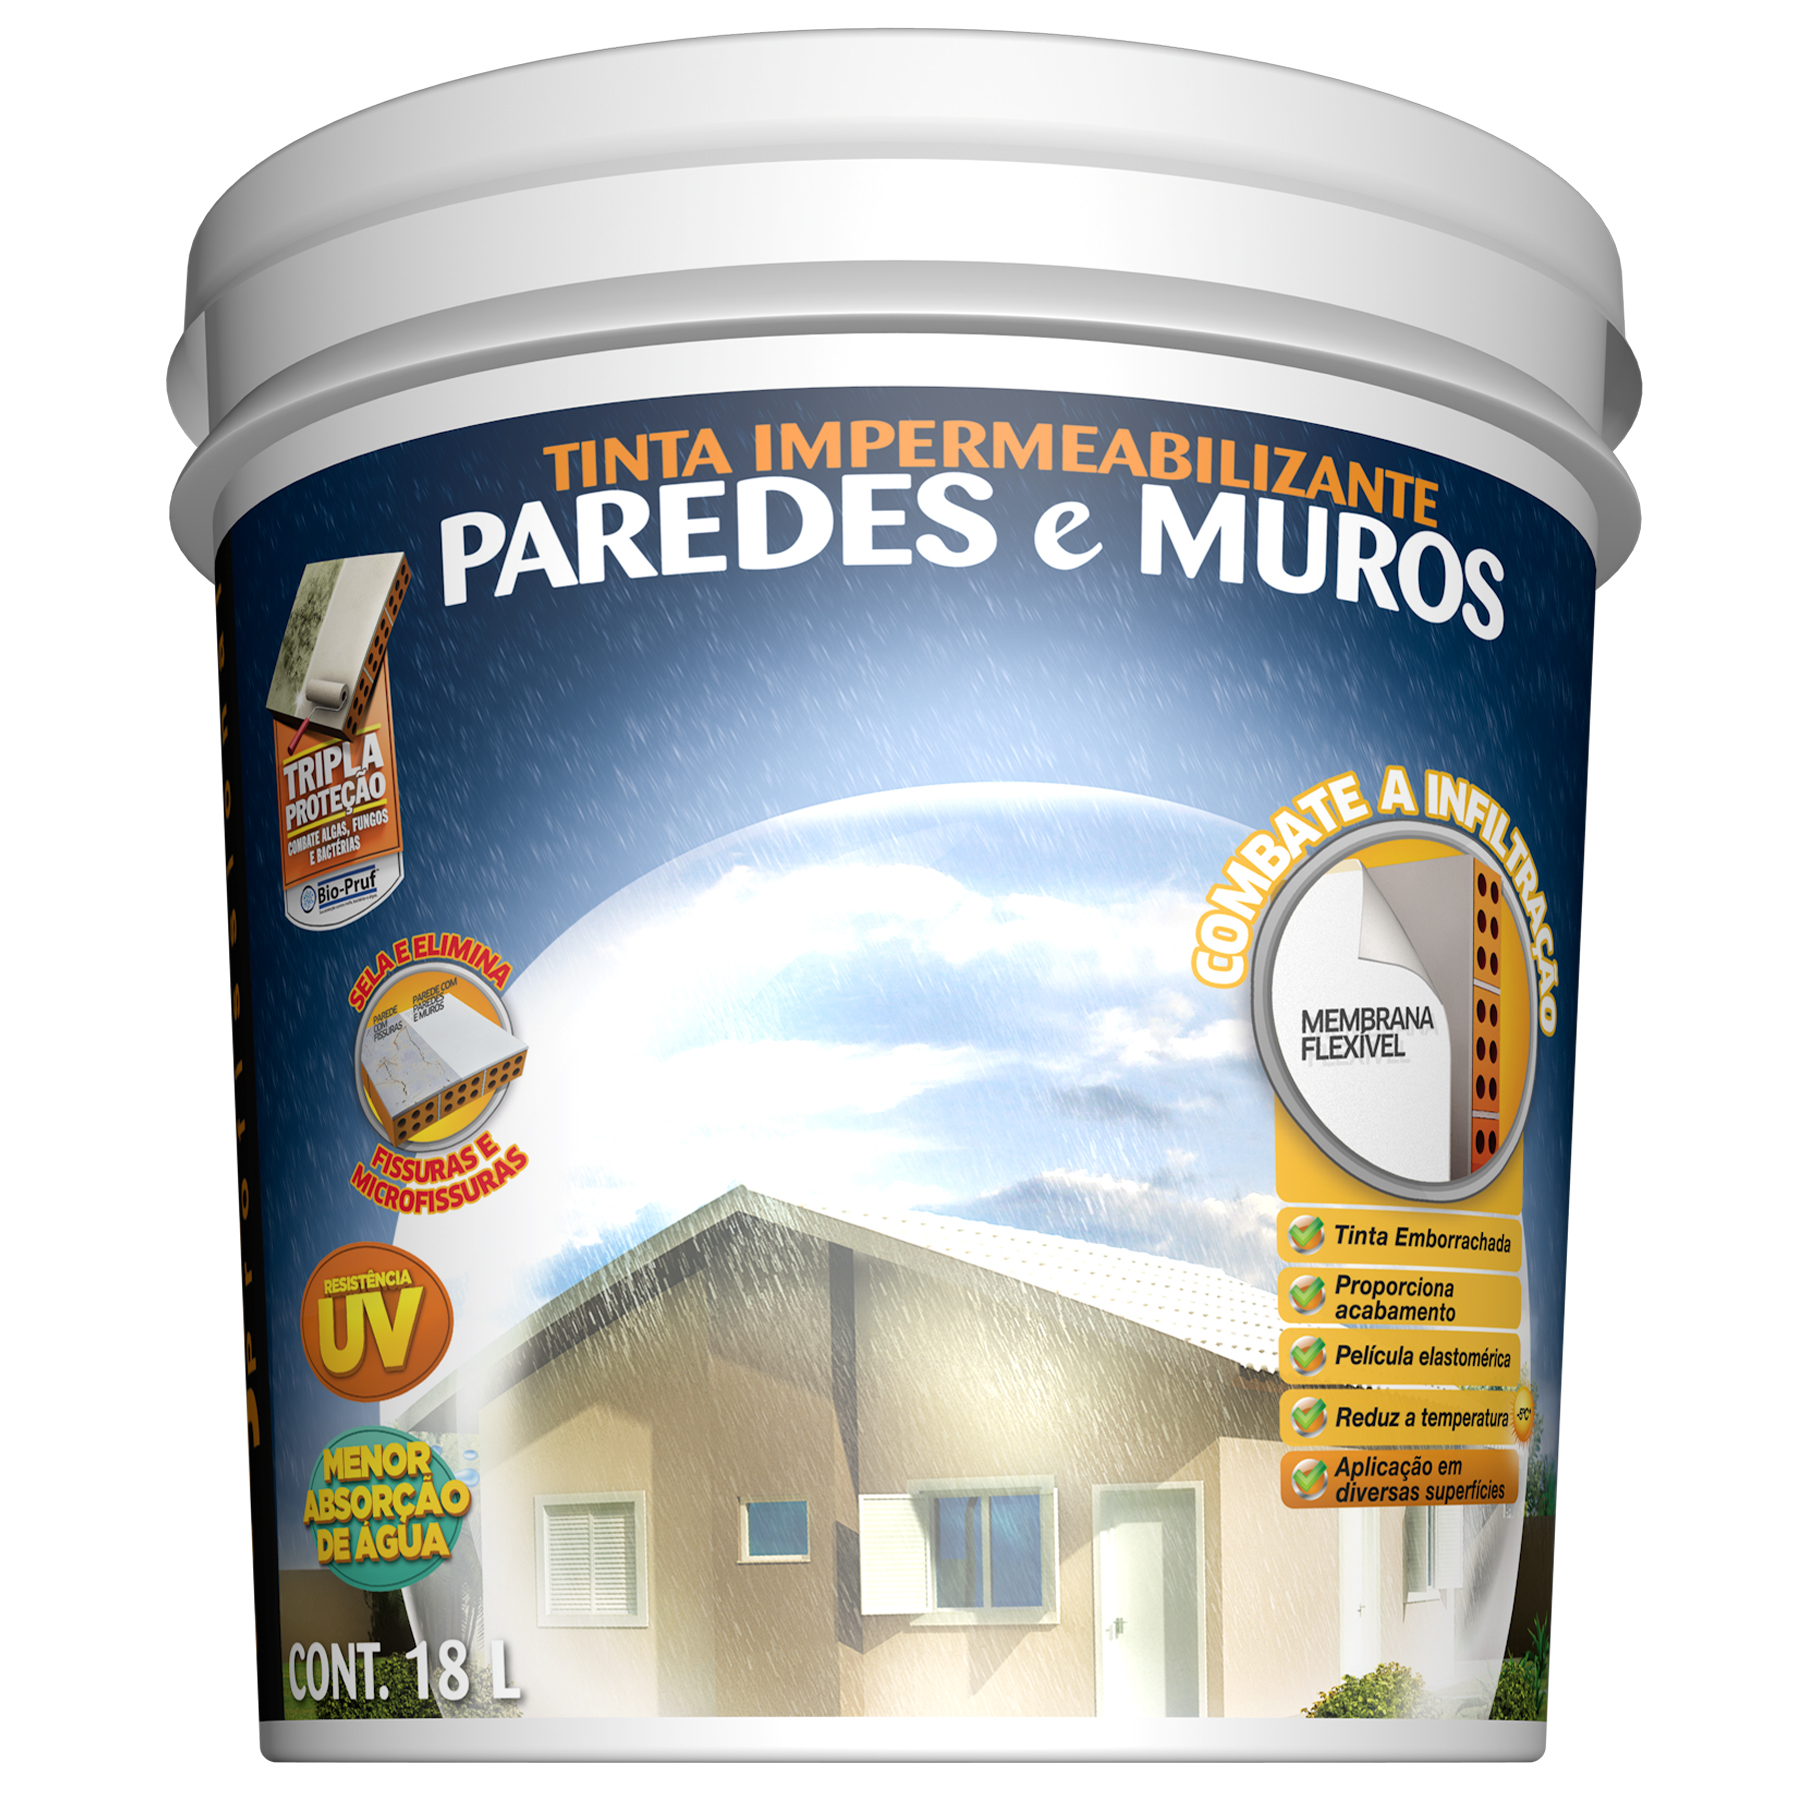 Tinta impermeabilizante paredes e muros 18l concreto - Impermeabilizante para paredes ...